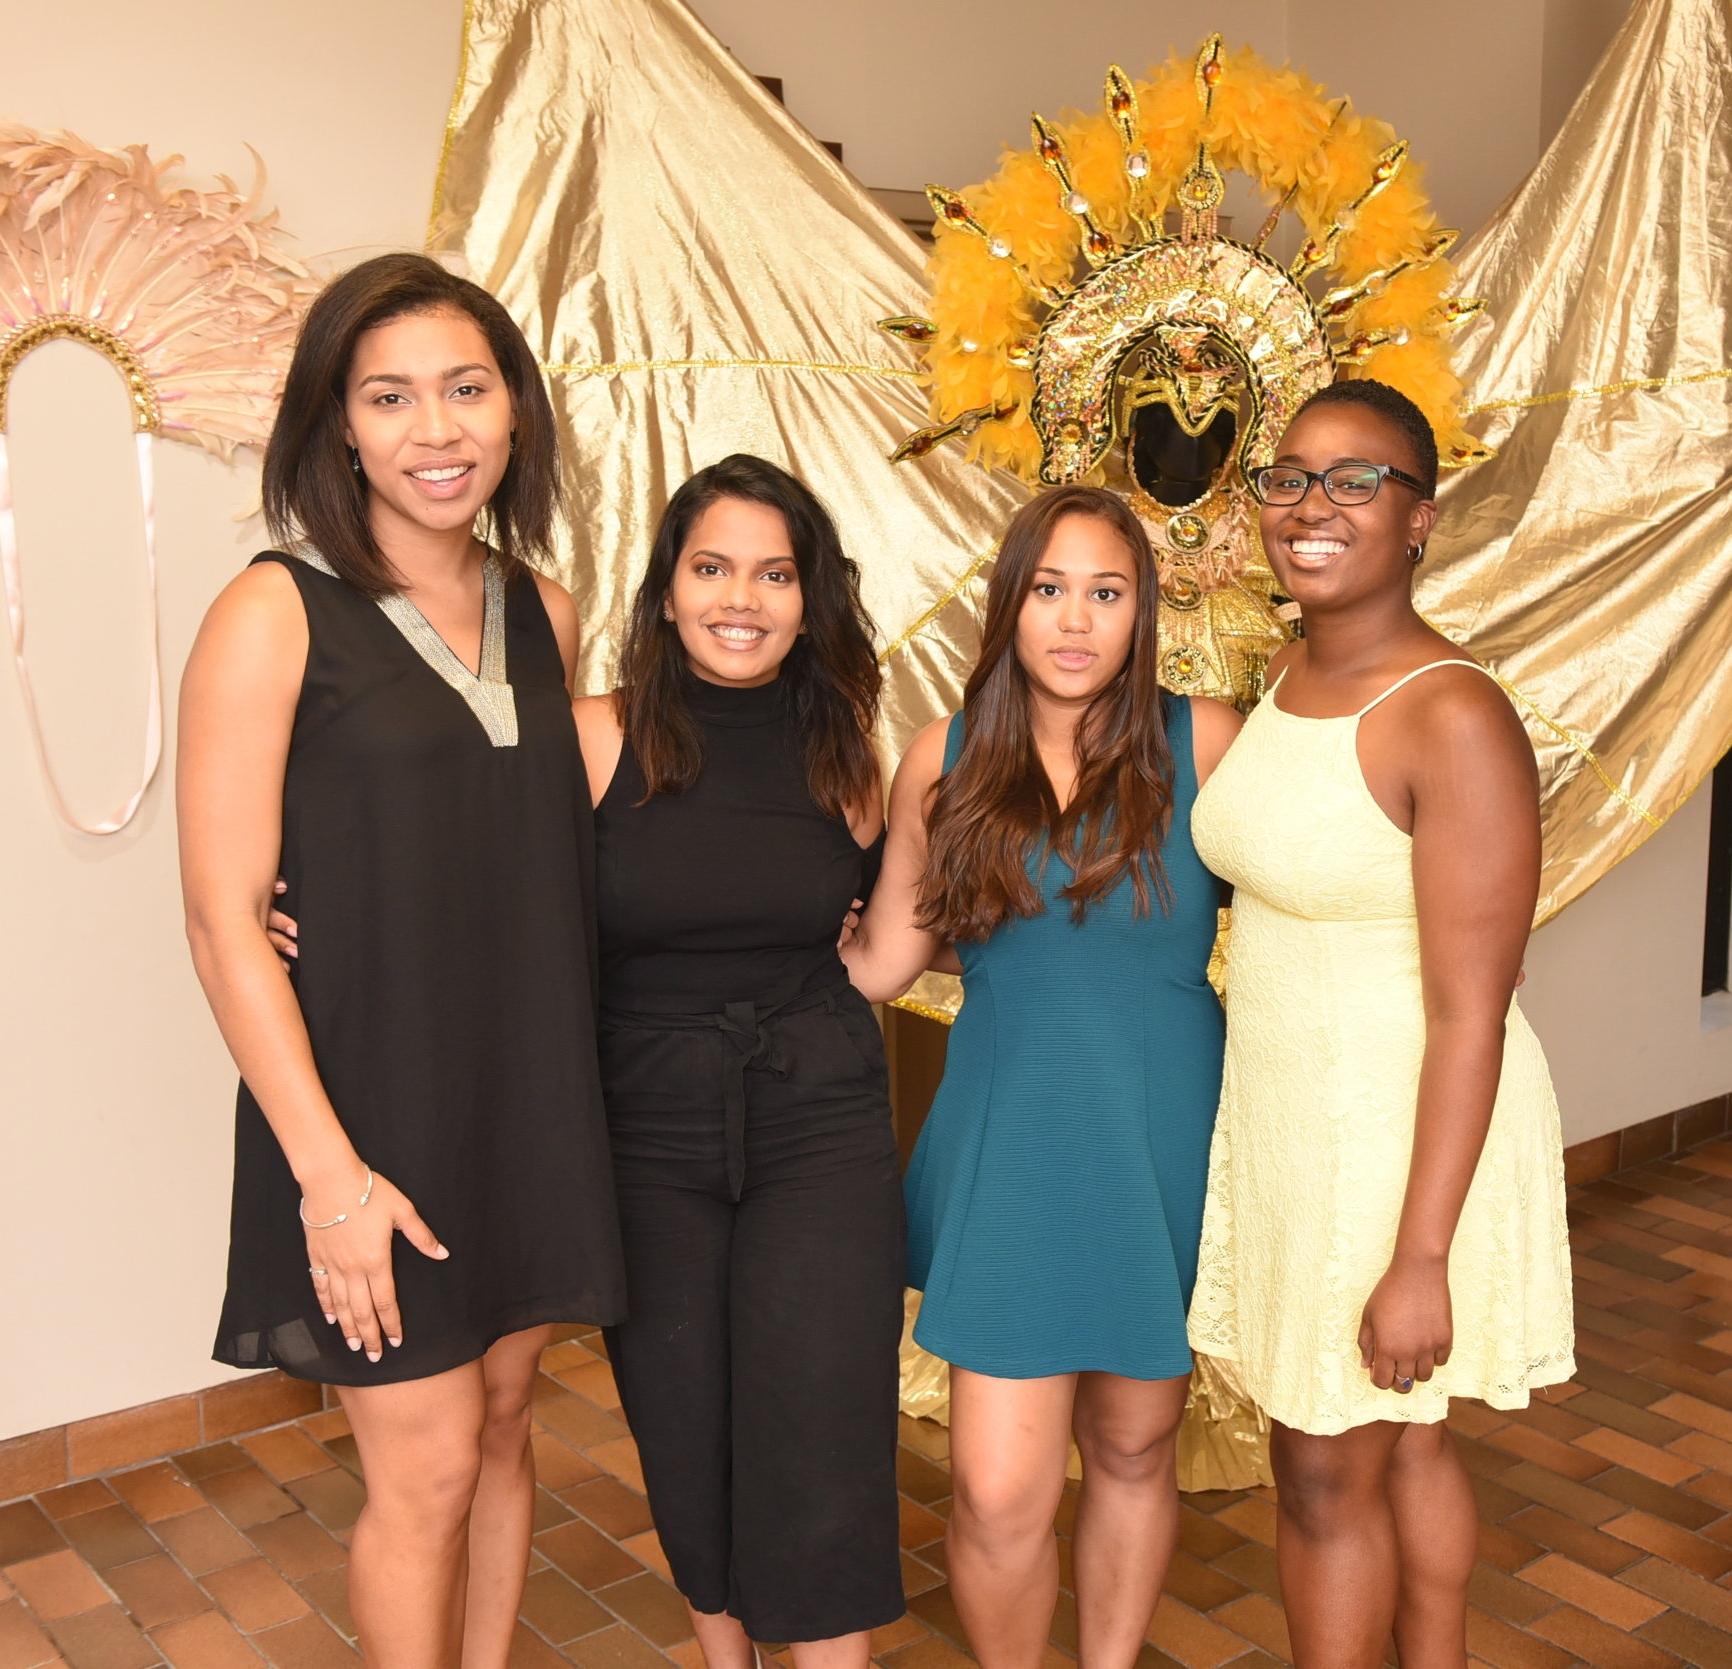 Brock University Trinidadian students Alyssa Davis (l), Sophie Hassanali, Sabrina Hoford & Annamarie Hudlin